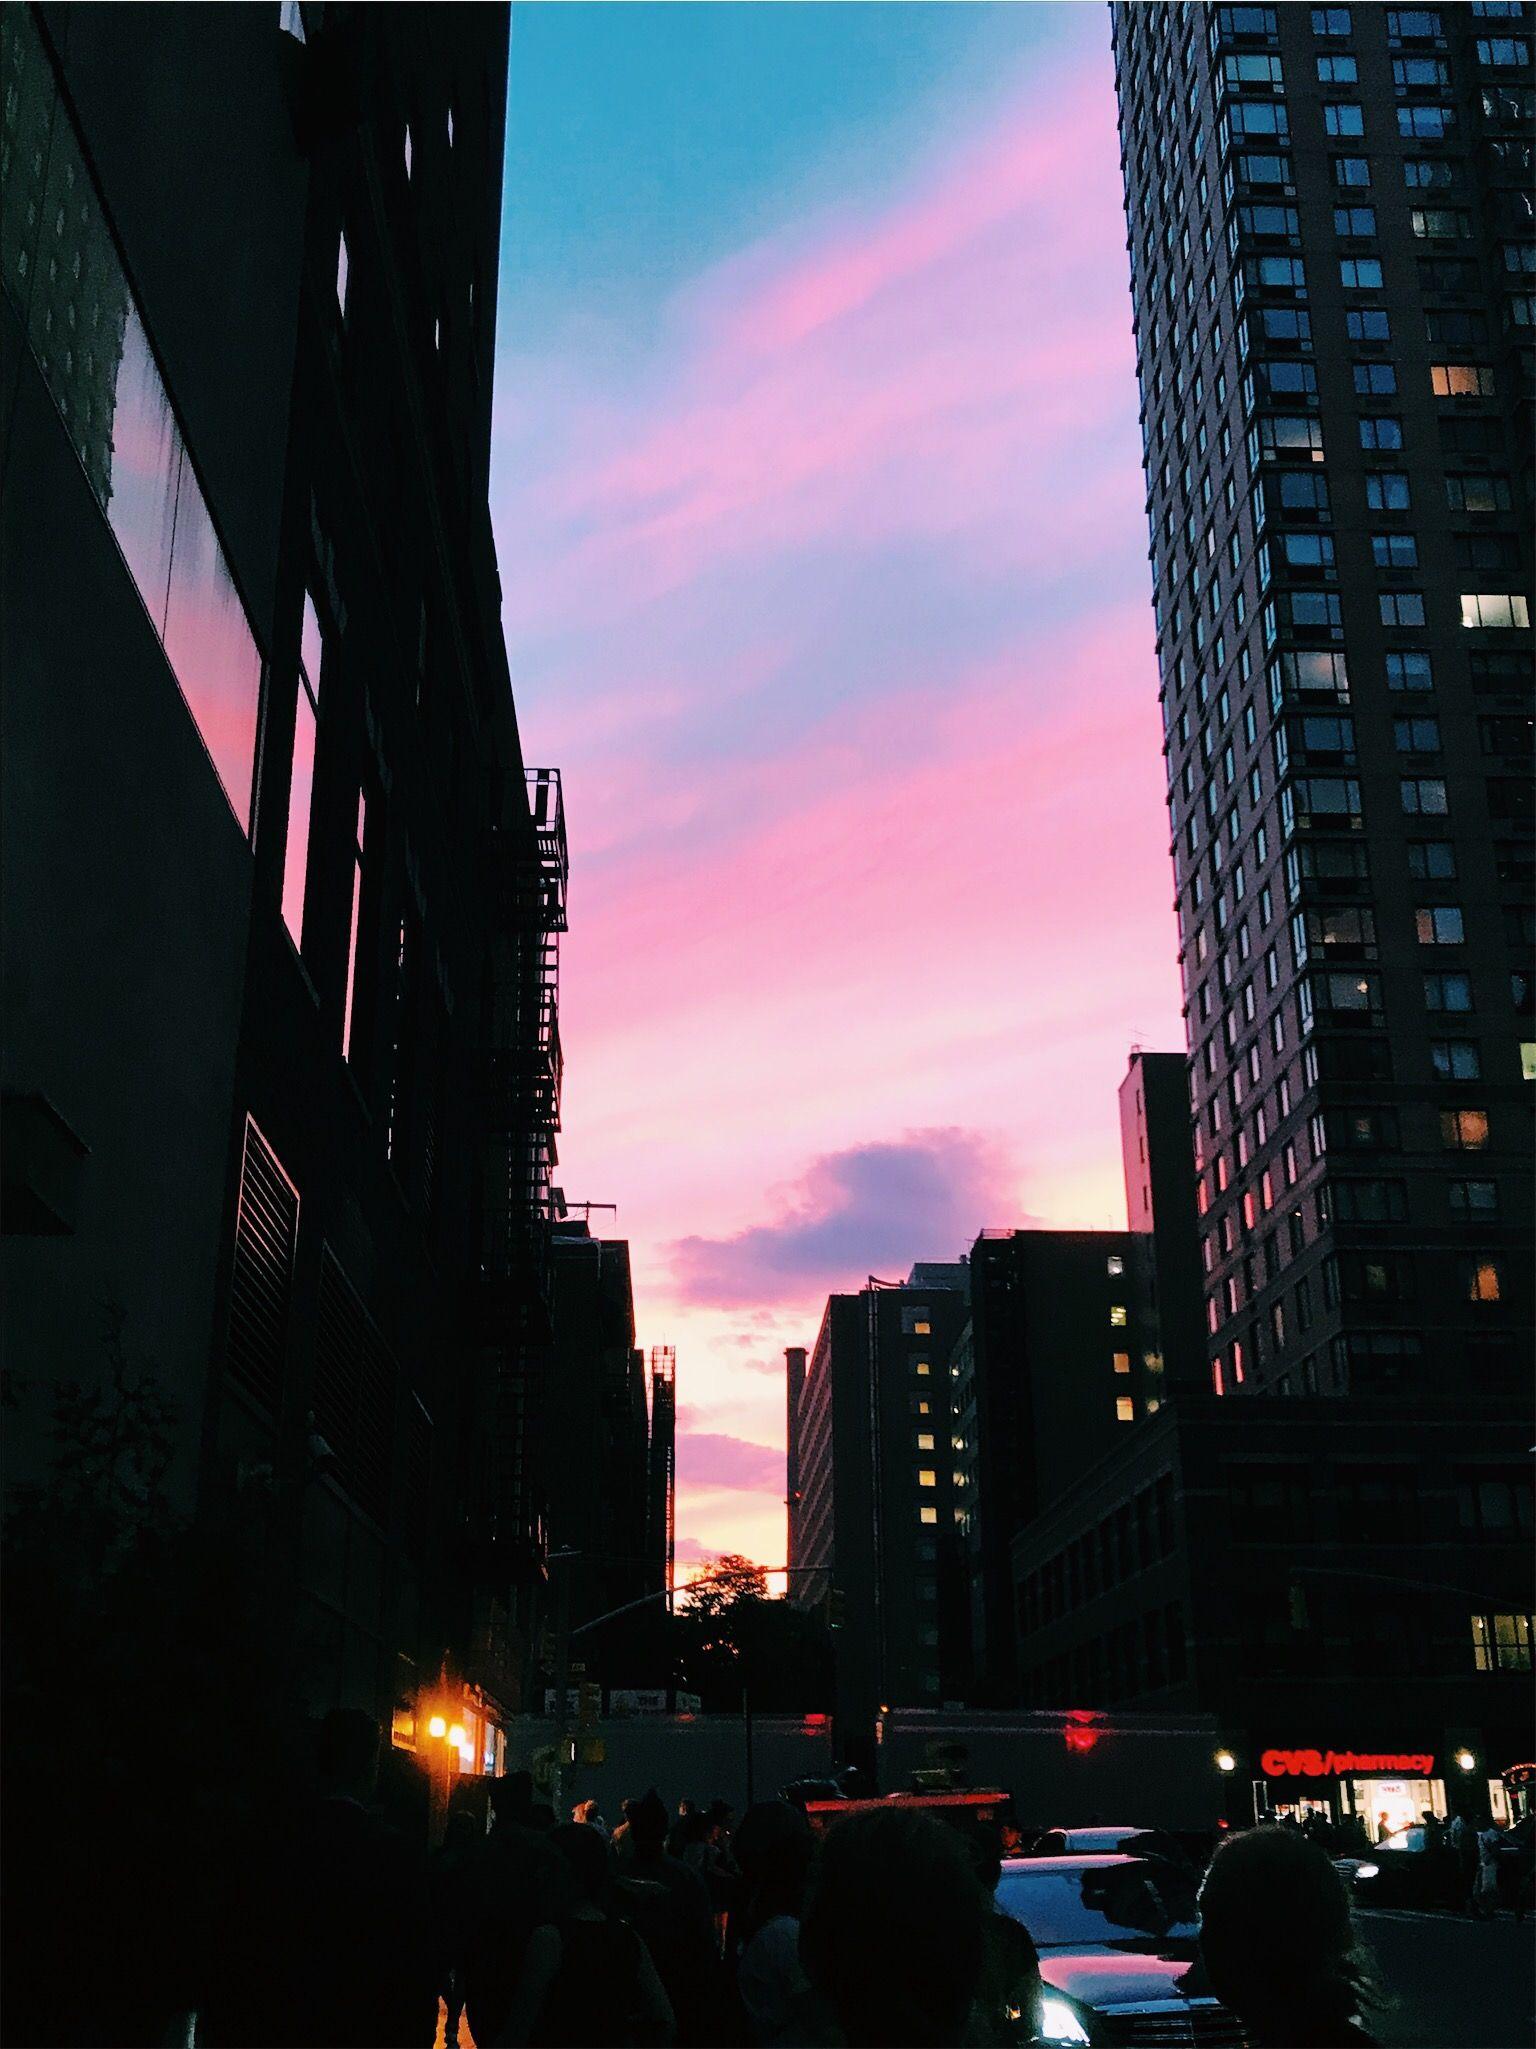 Pinterest Cosmicislander Sky Aesthetic Pretty Sky Sunset City